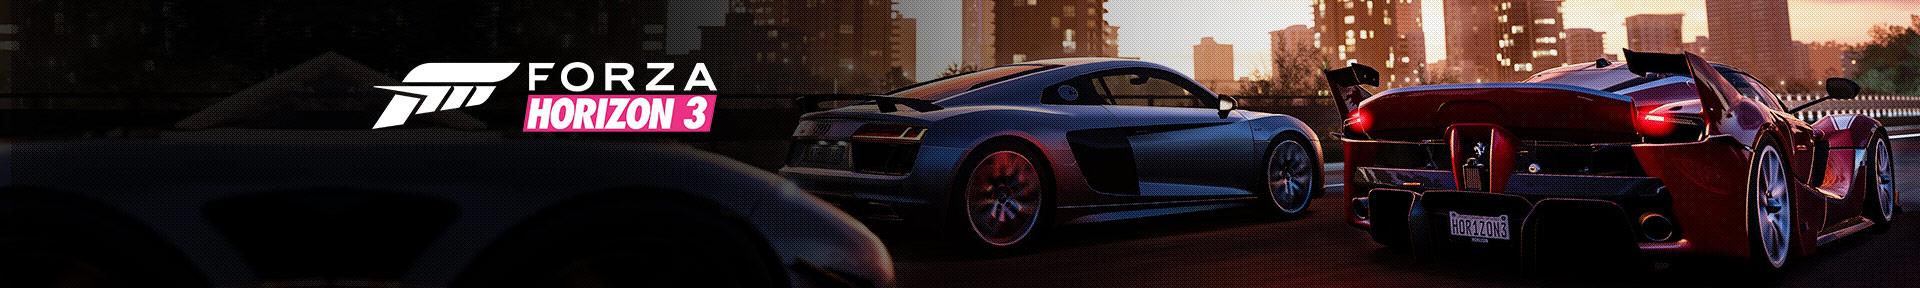 Forza Horizon 3 Credits